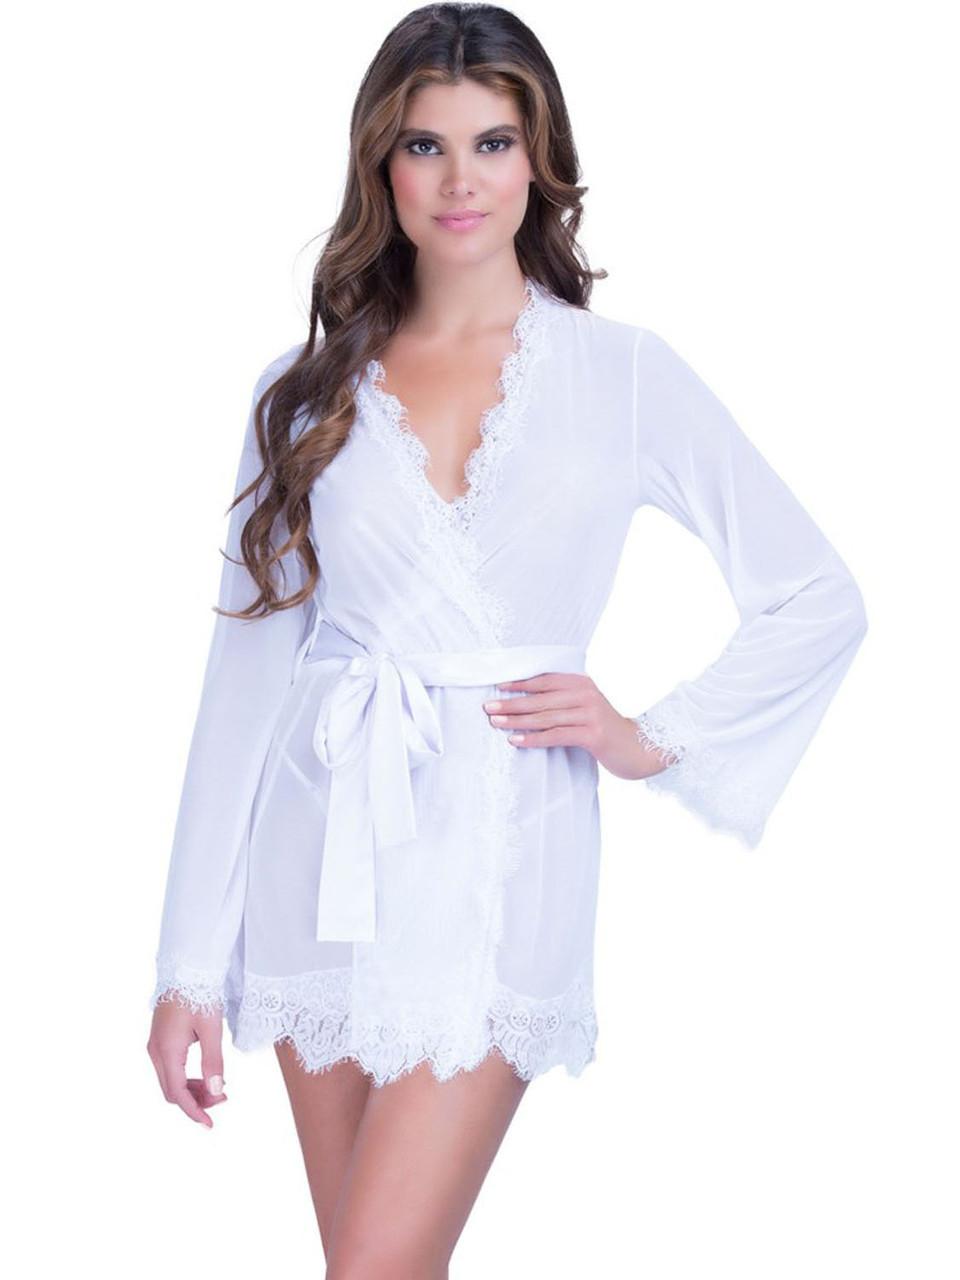 Сексуальный белый халат